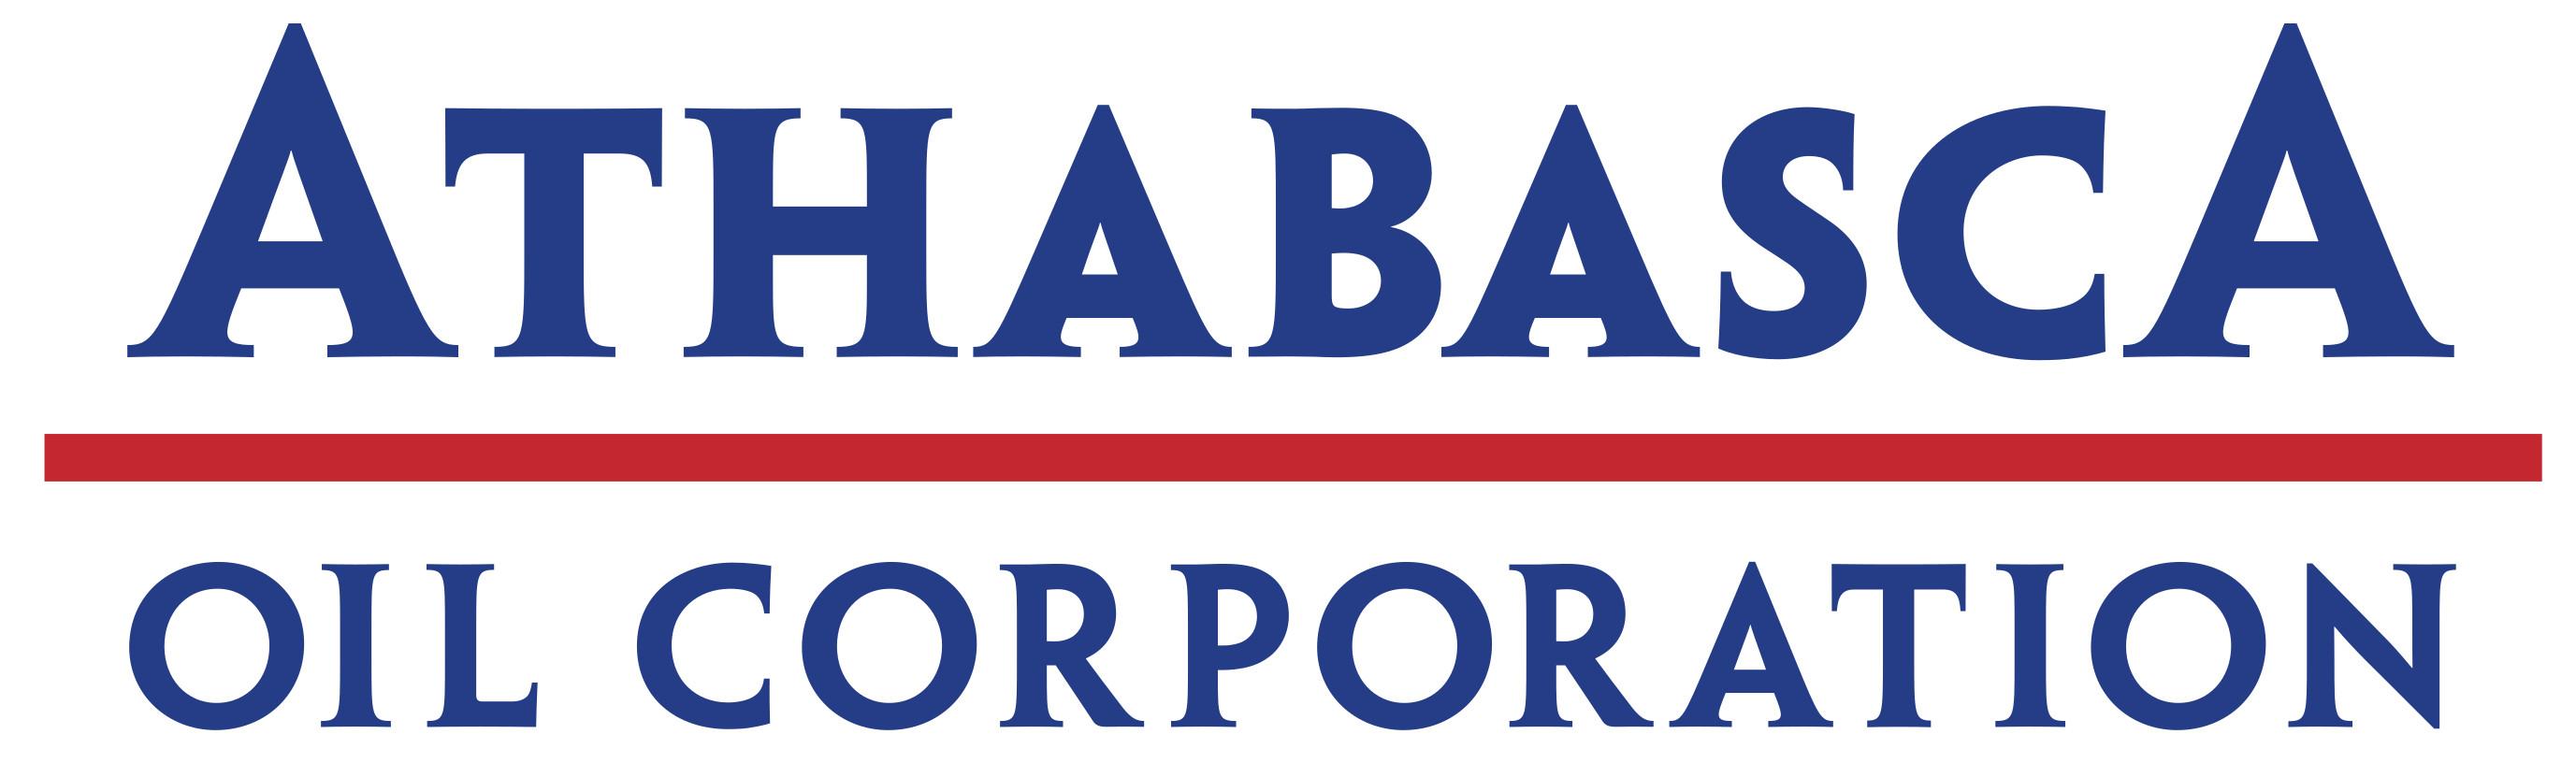 Athabasca Oil Corporation Halts 2020 Capital Program